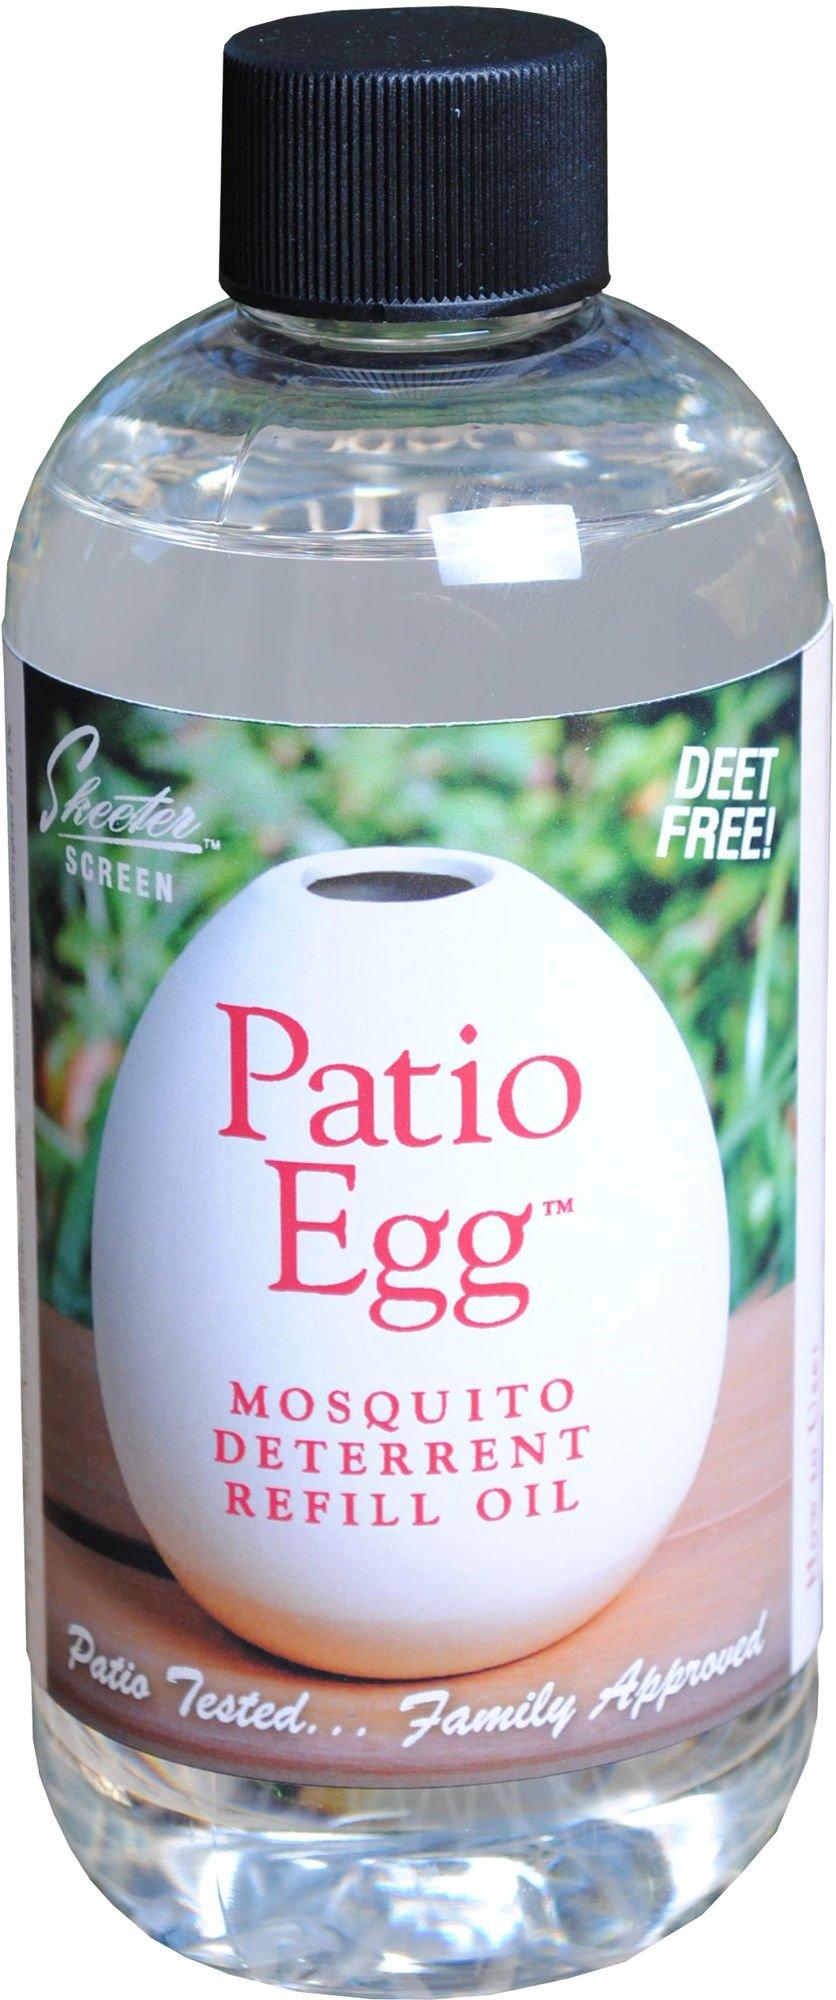 Scent Shop 90602 Skeeter Screen Patio Egg Mosquito Deterrent Refill Oil, 8 Ounces, 1,